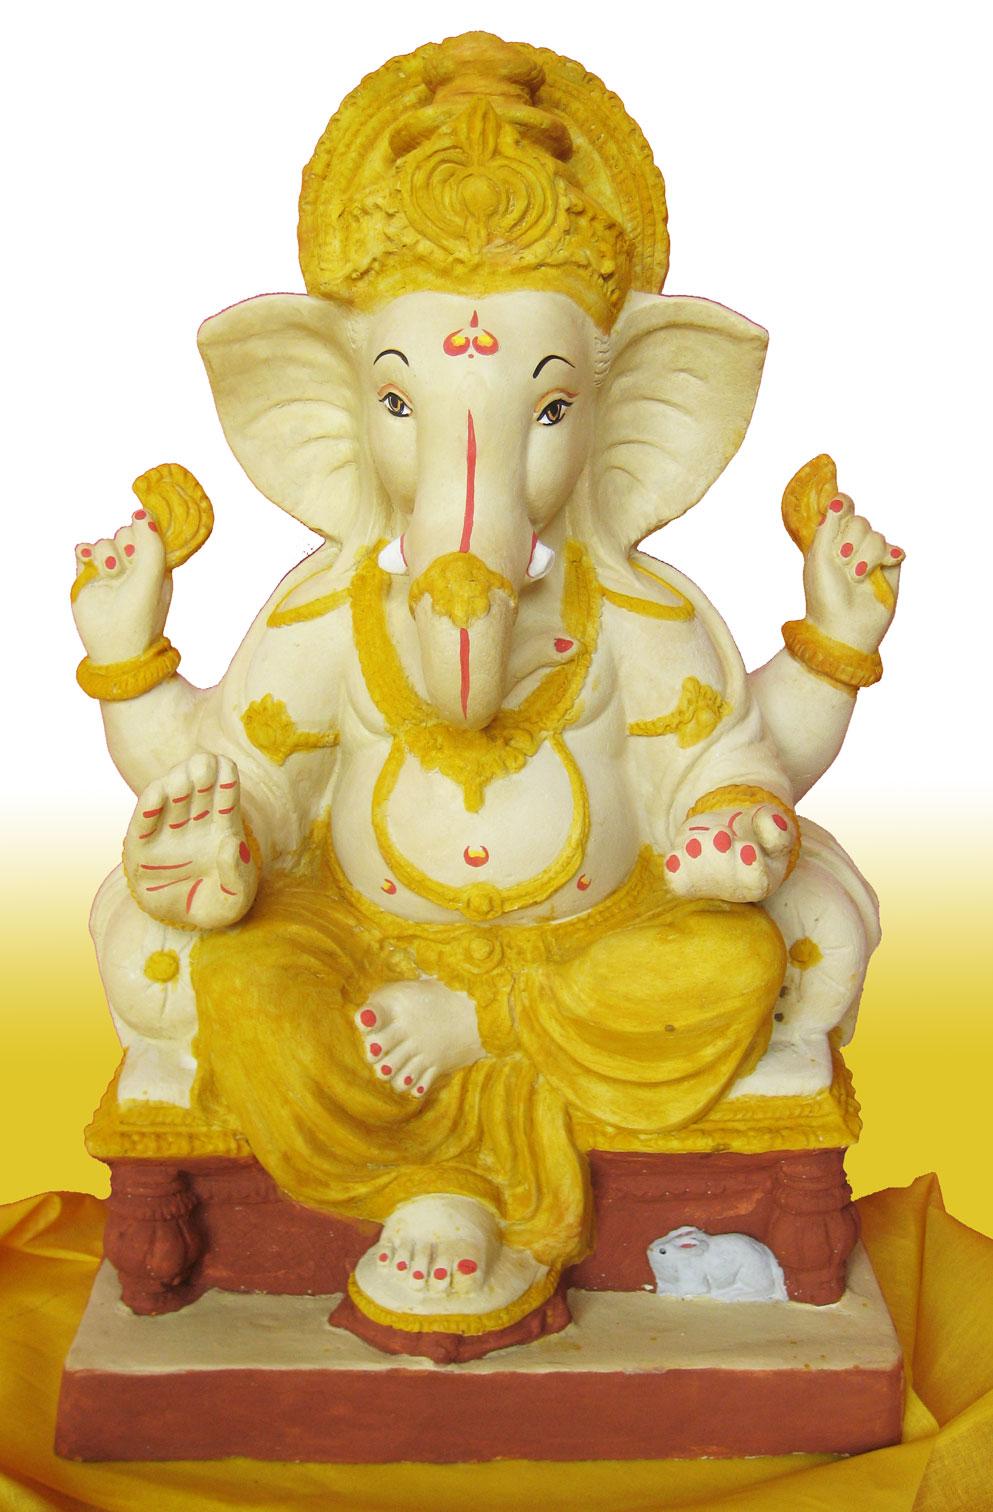 The Hdpng.com  - Ganesh Idol, Transparent background PNG HD thumbnail